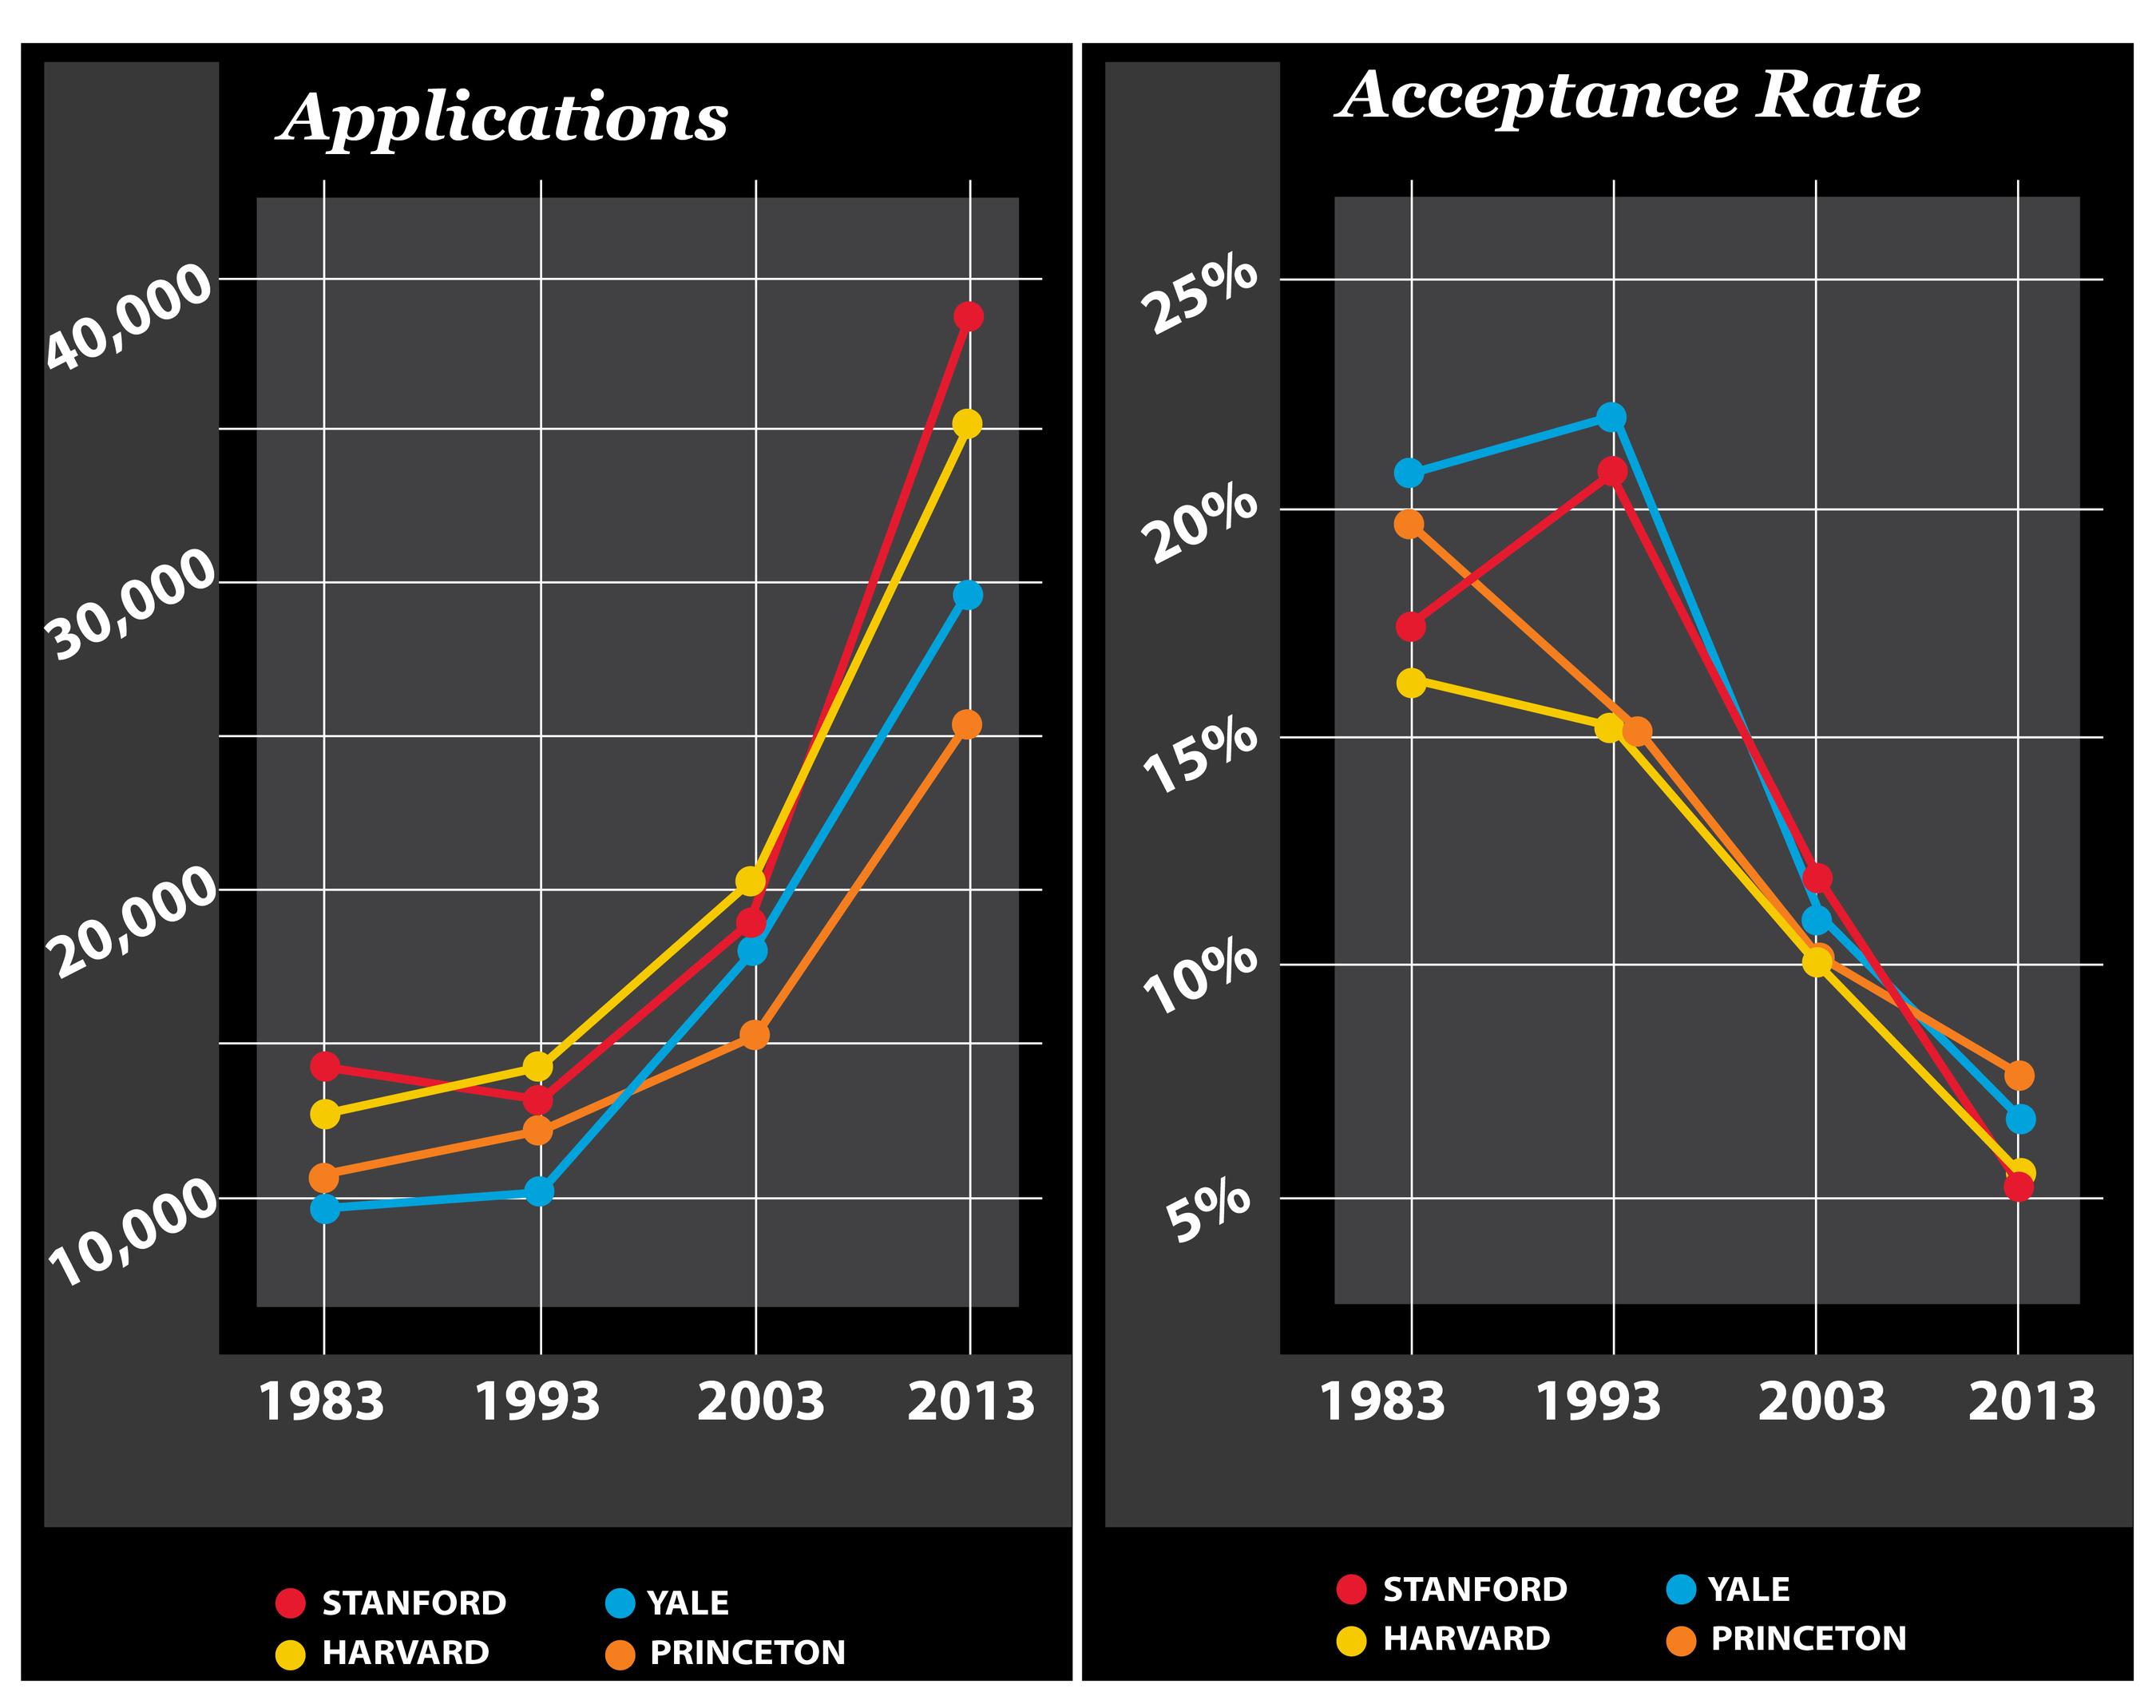 Nick Standlea, Test Prep Gurus, College Admissions Chart (PRNewsFoto/Nick Standlea) (PRNewsFoto/Nick Standlea)